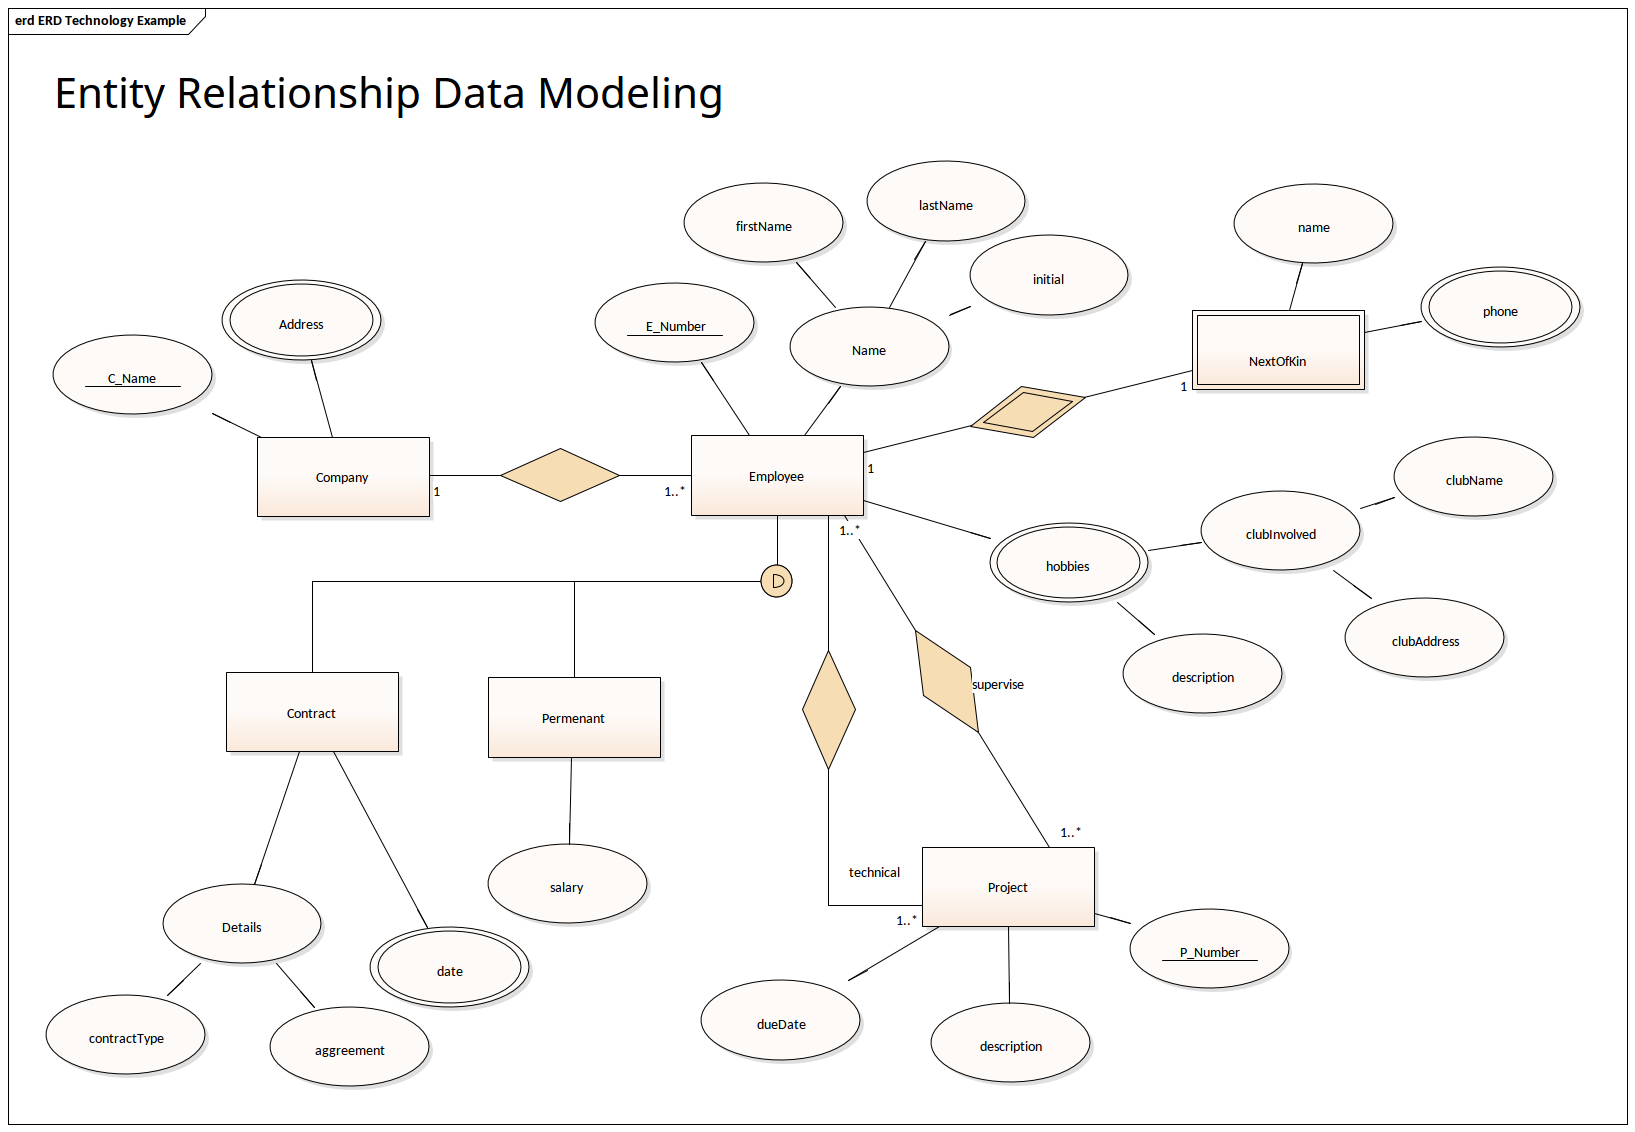 Entity Relationship Data Modeling | Enterprise Architect throughout Database Entity Relationship Diagram Tutorial